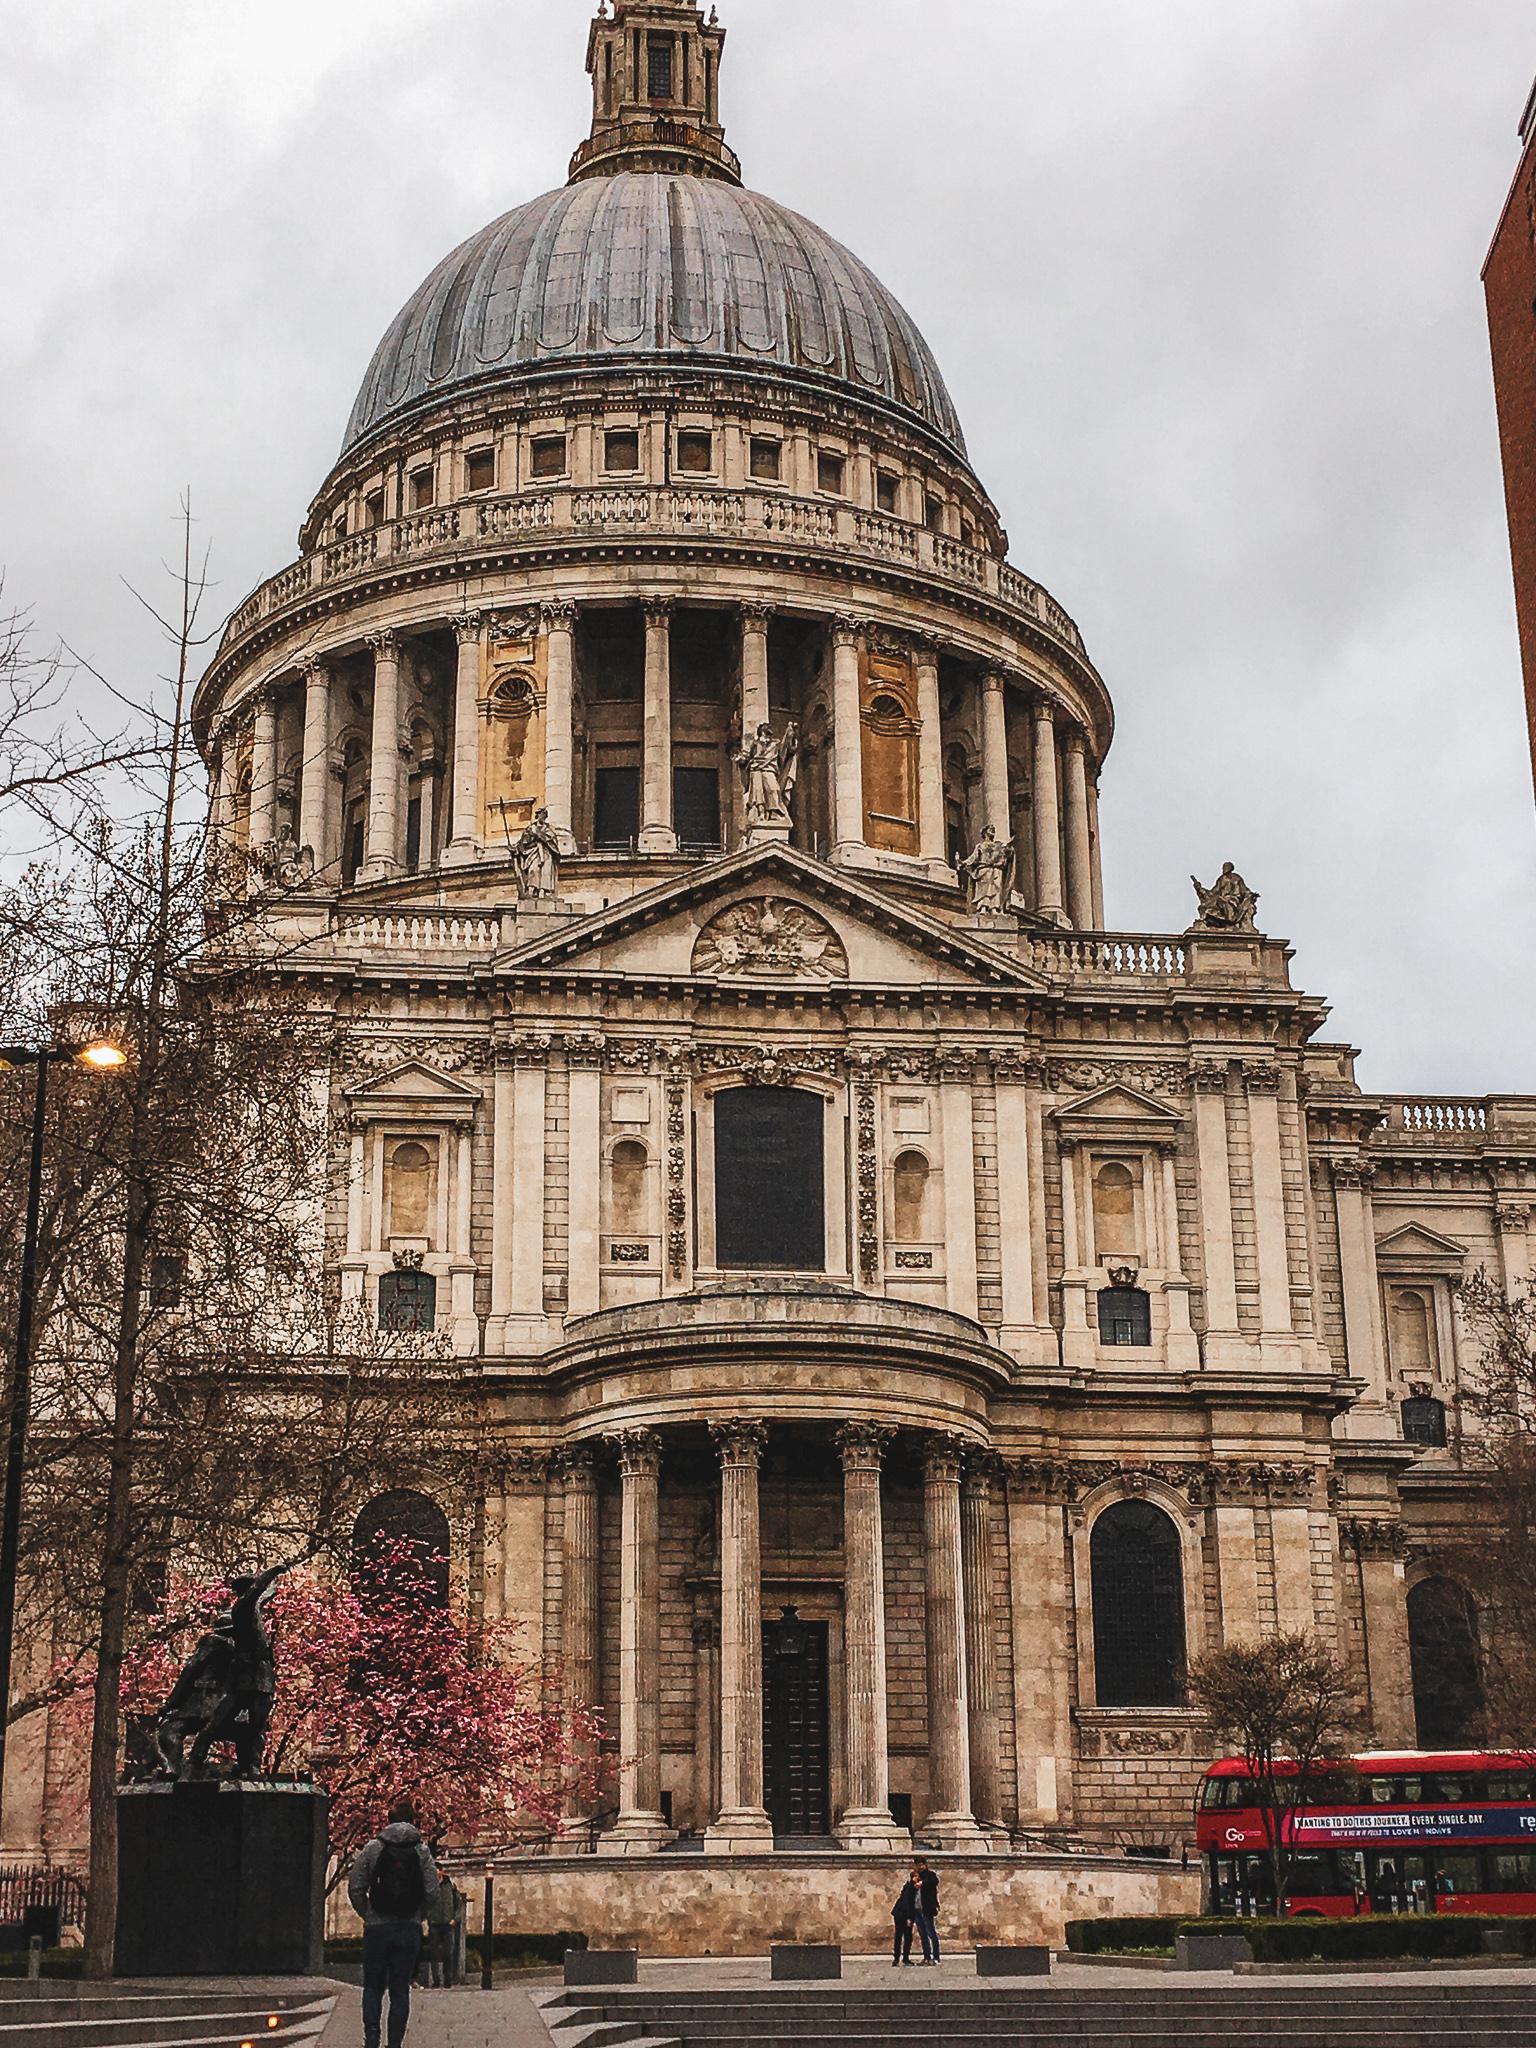 Photo Guide To London Landmarks